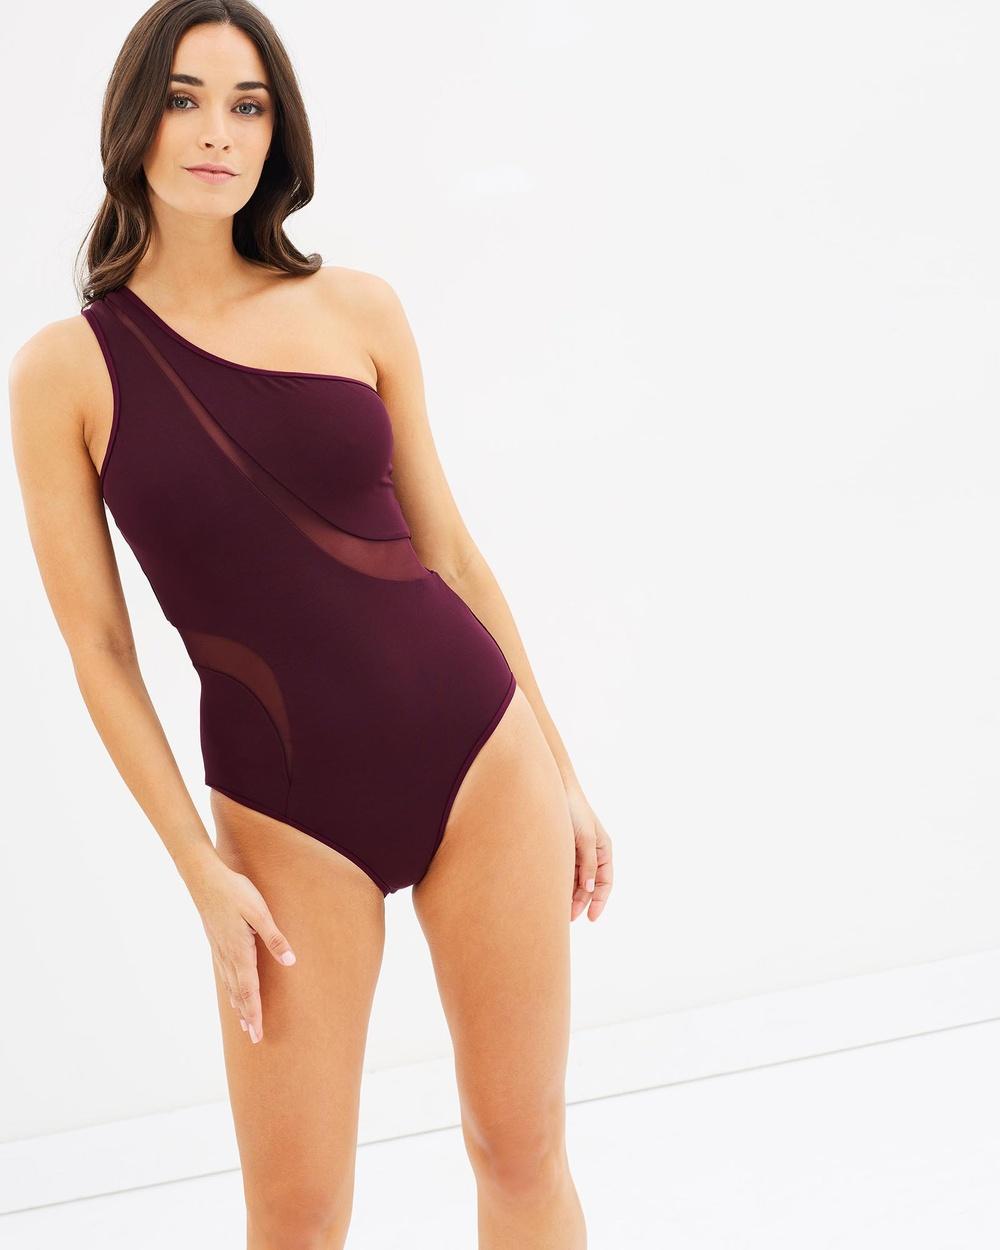 JETS Asymmetrical Swimsuit One-Piece / Swimsuit Claret Asymmetrical Swimsuit